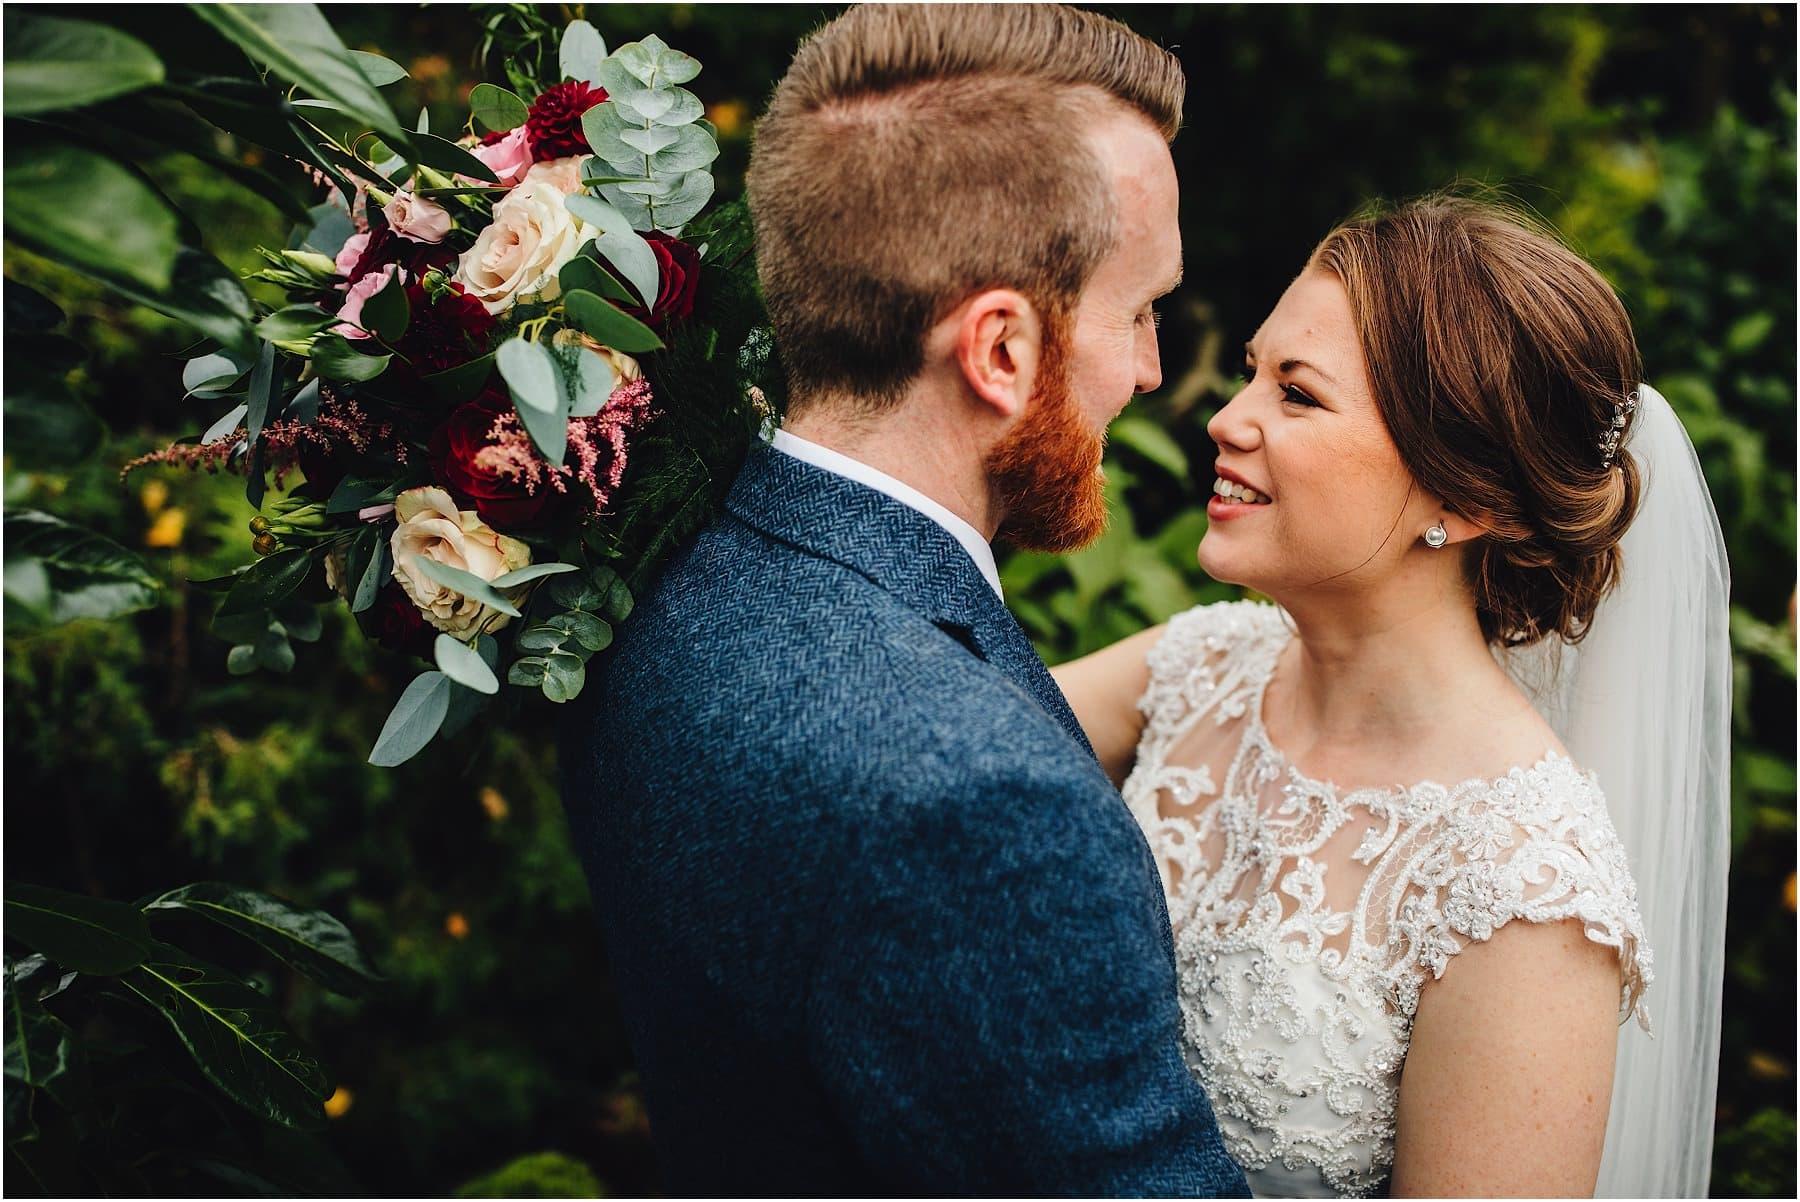 10 Top Wedding Barn Venues in The Midlands